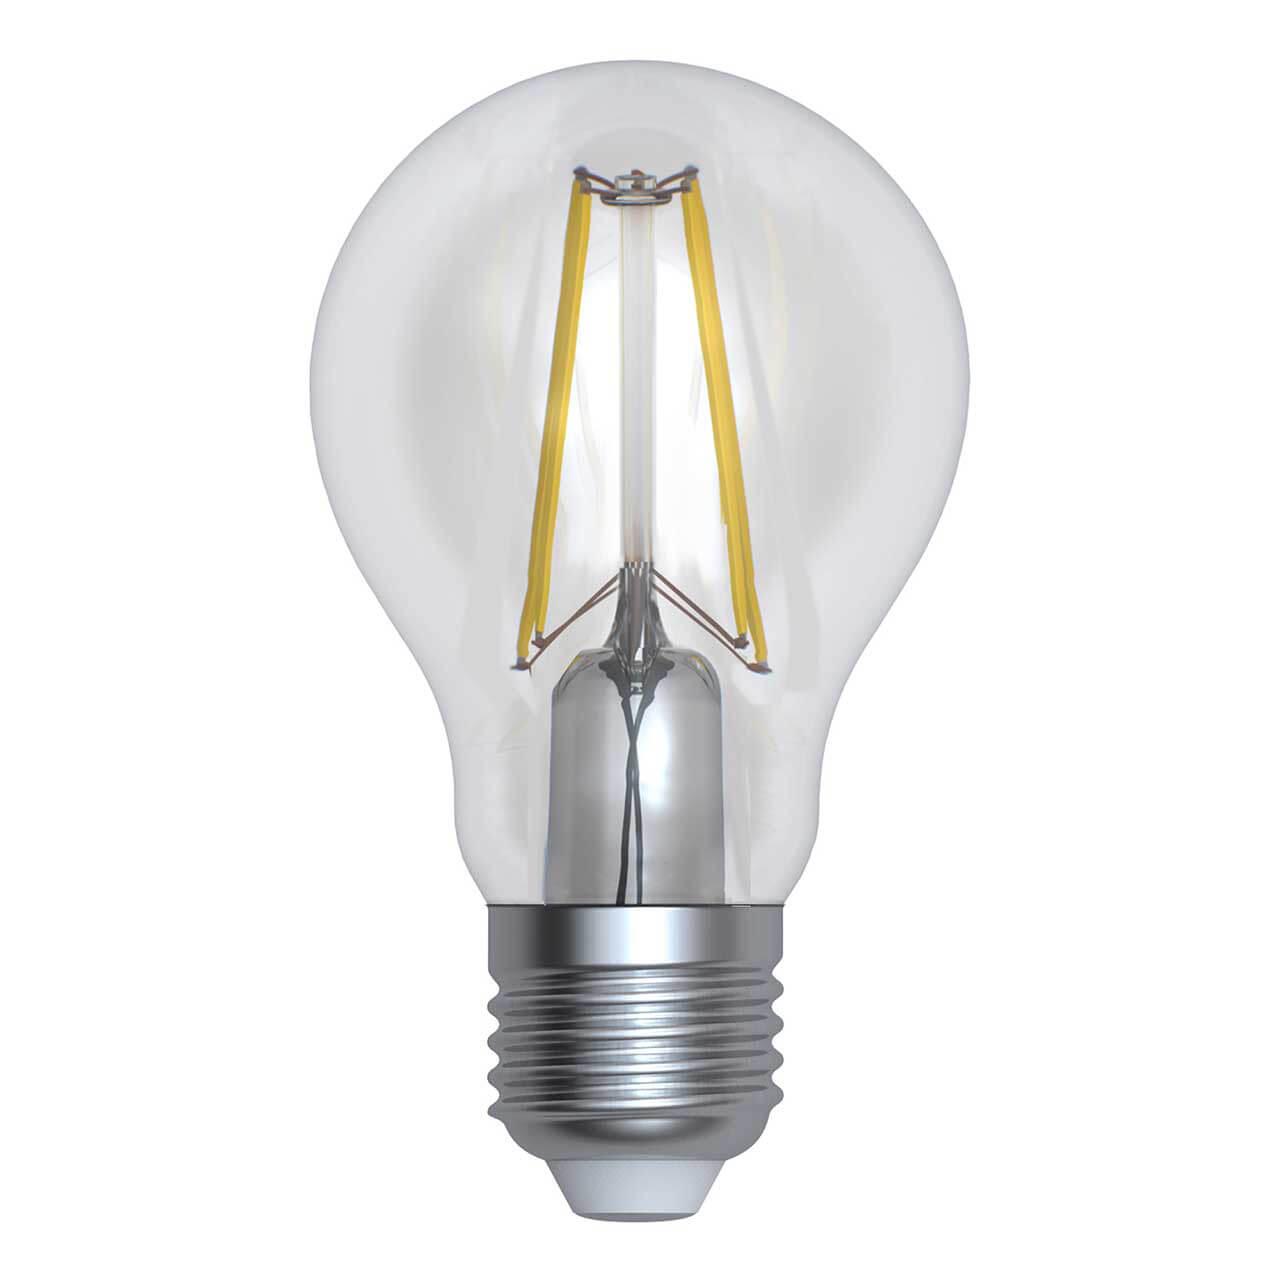 Фото - Лампочка Uniel LED-A60-12W/3000K/E27/CL PLS02WH LED-A60 лампочка uniel led g45 13w 3000k e27 cl pls02wh sky